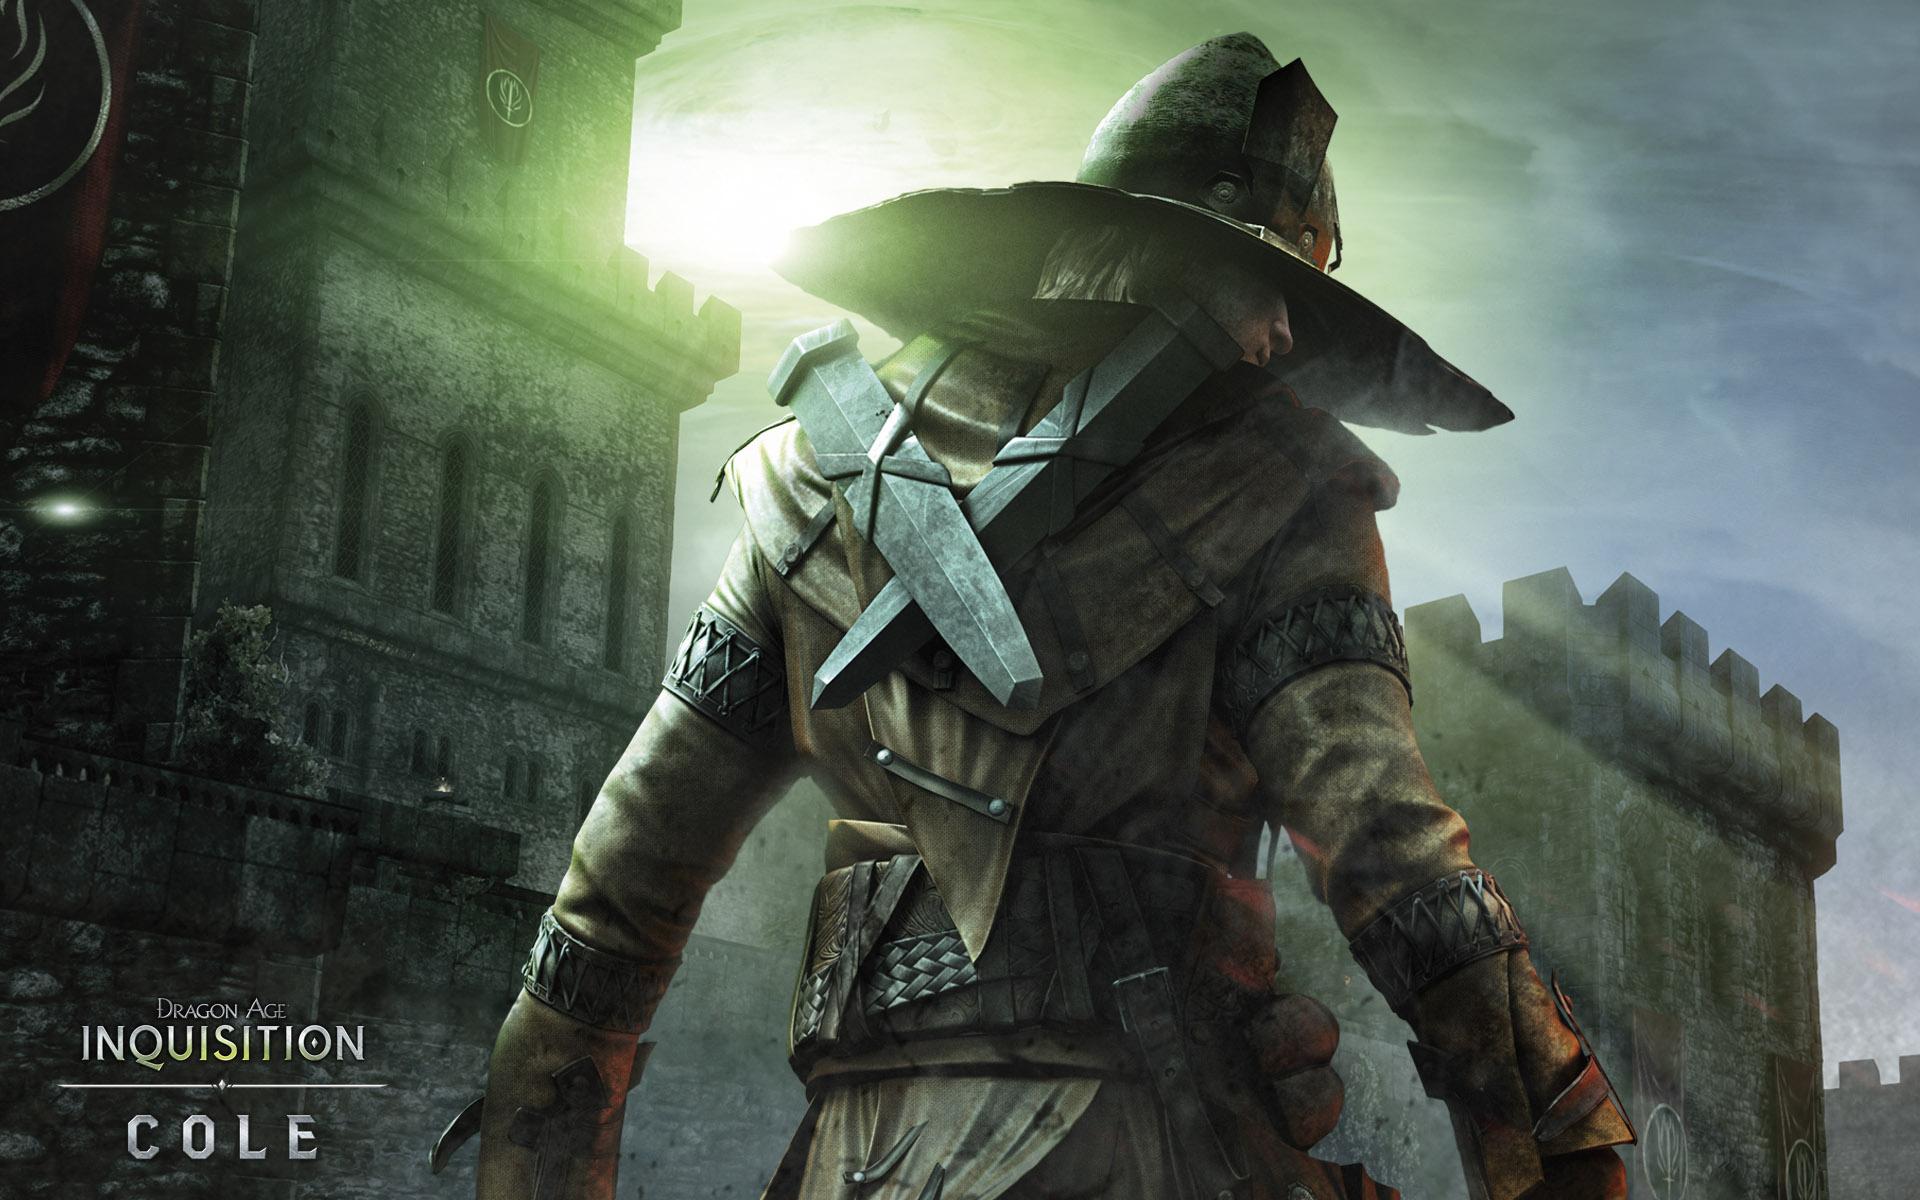 Dragon Age Inquisition Fondo De Pantalla Hd Fondo De